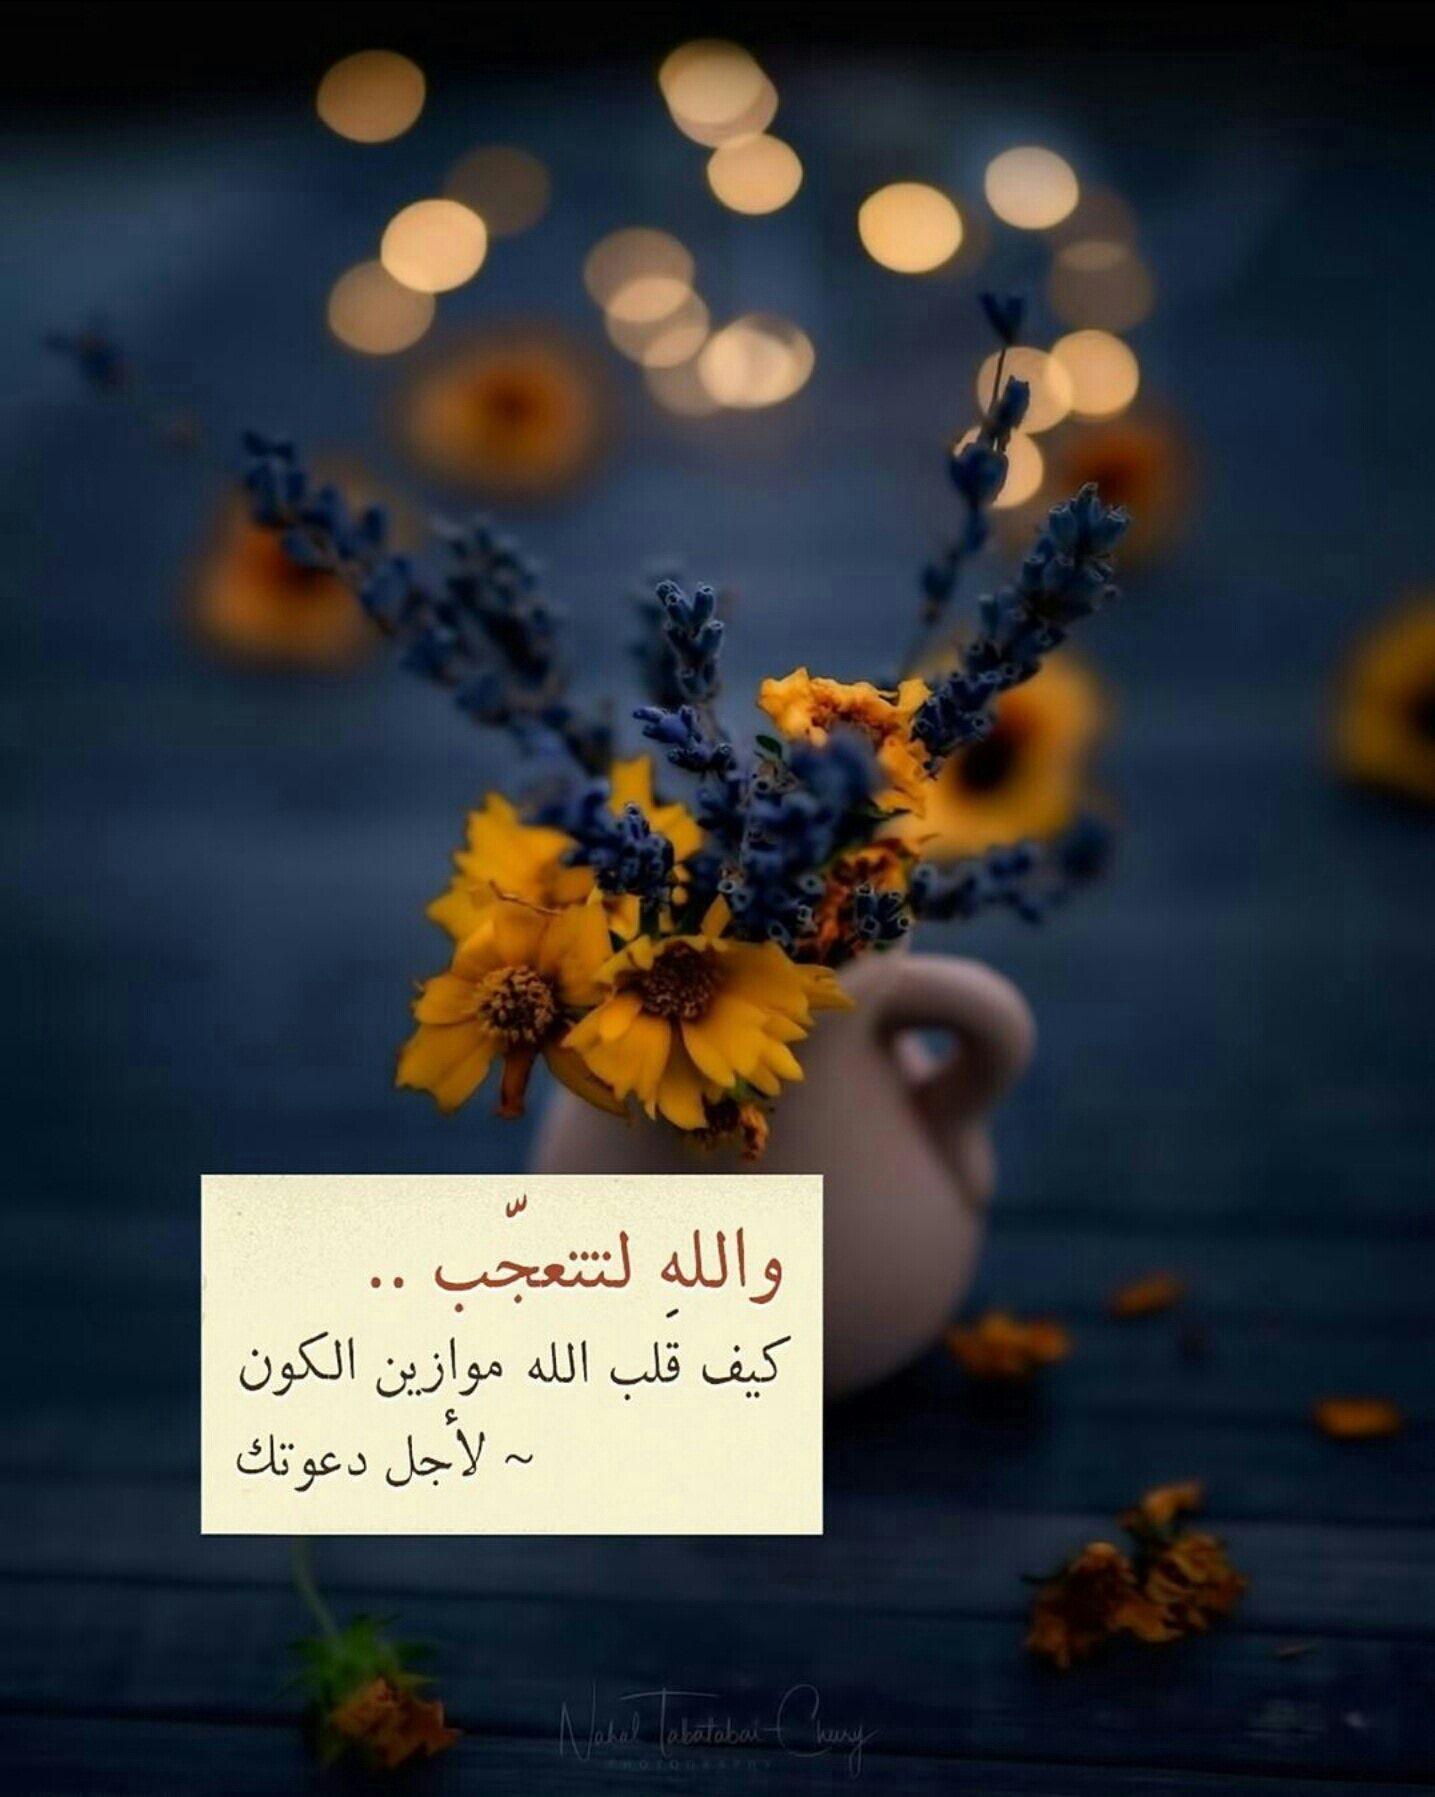 خواطر اسلامية بالصور Islamic Quotes Wallpaper Quran Quotes Inspirational Islamic Quotes Quran